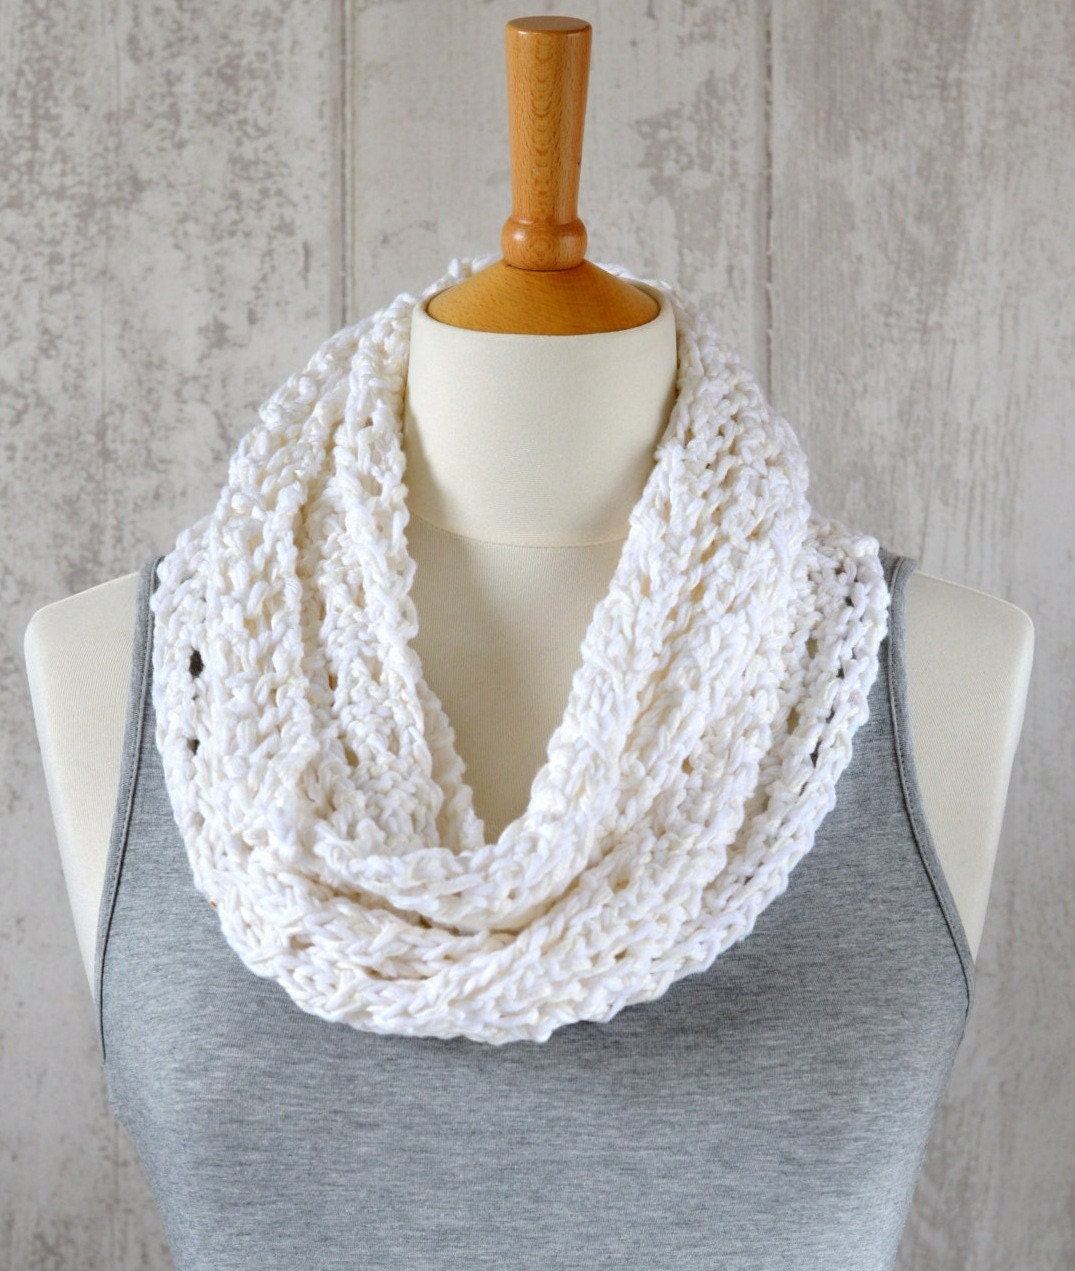 KNITTING PATTERN Lace Scarf Simple Knit Pattern Infinity Scarf ...